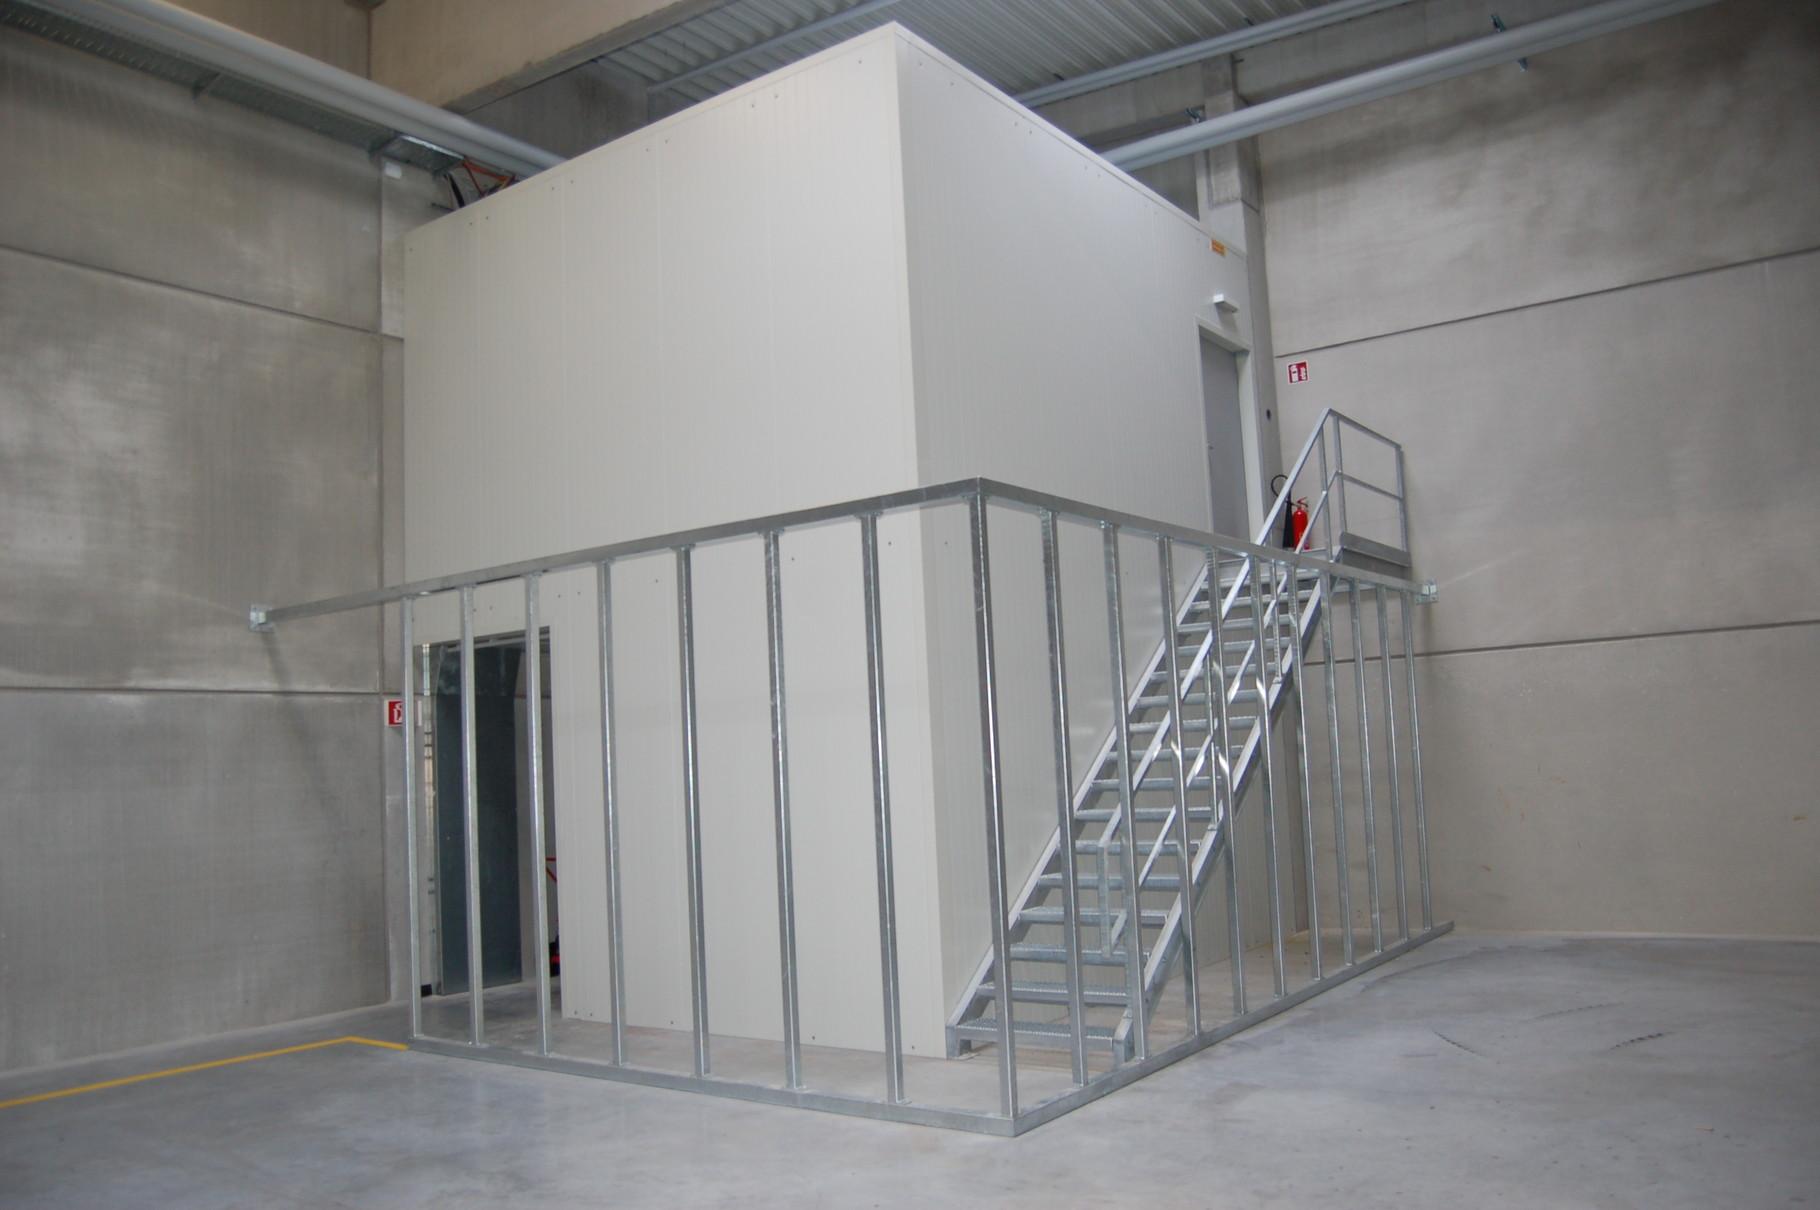 Stahlkonstruktion verkleidet mit Brandschutzpaneelen, EG Logistikbüro - OG Technikraum